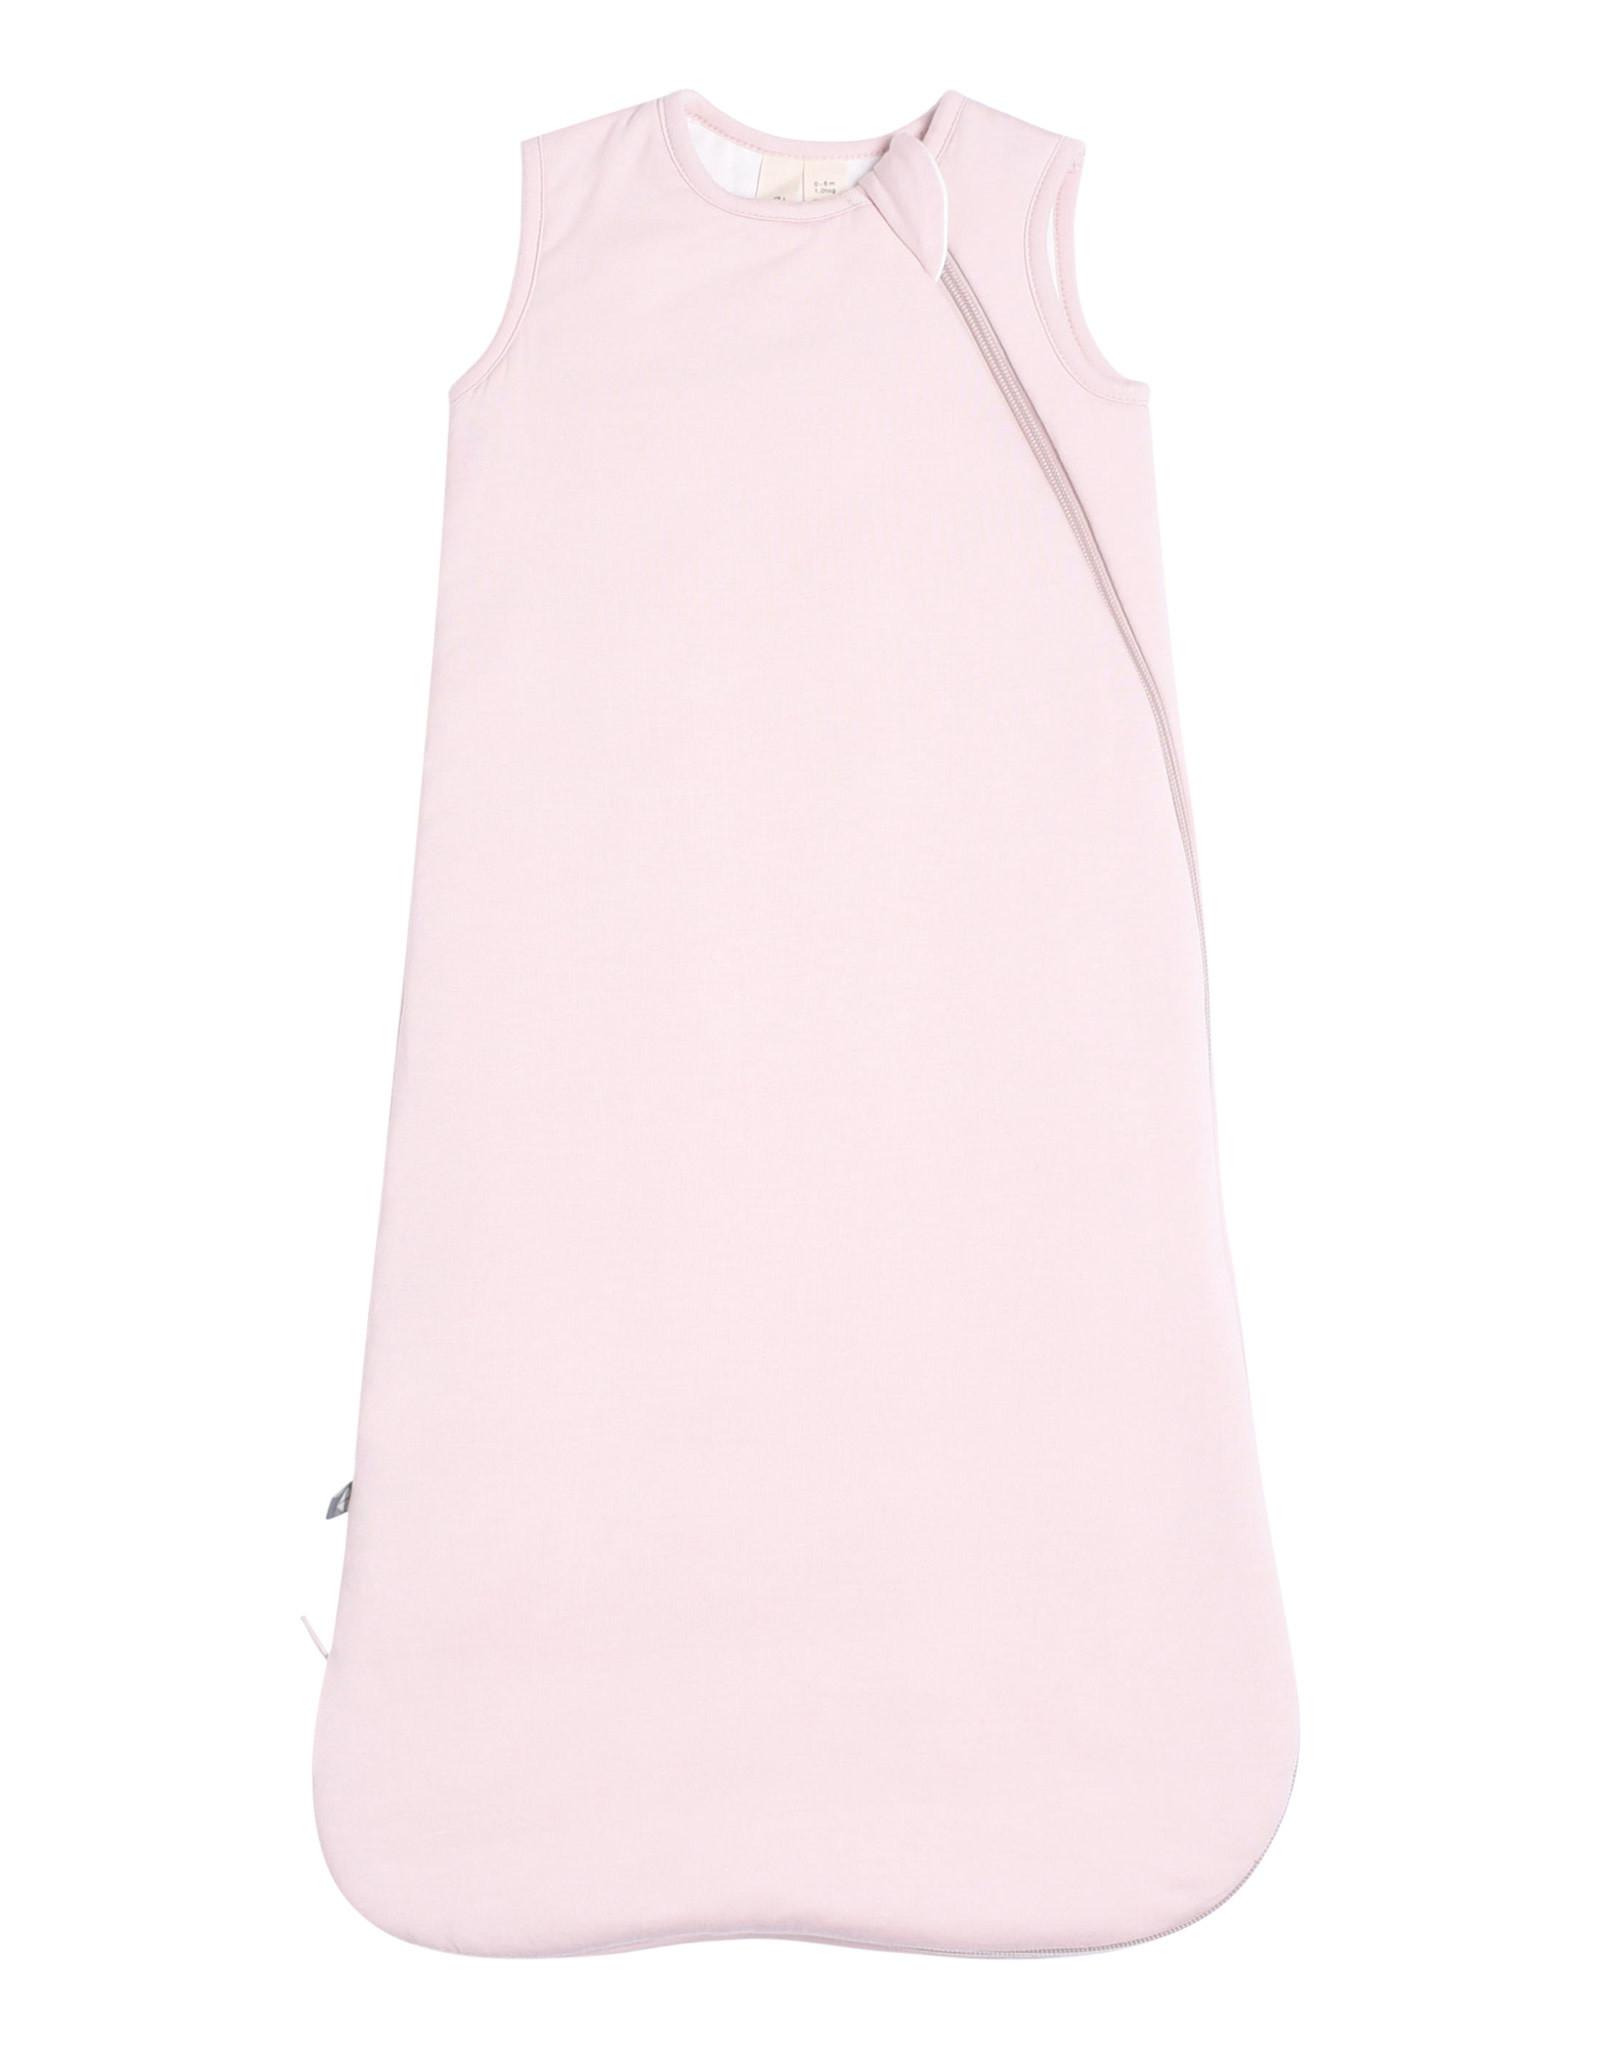 Kyte Baby sleep bag 1.0 (0-6m)- blush